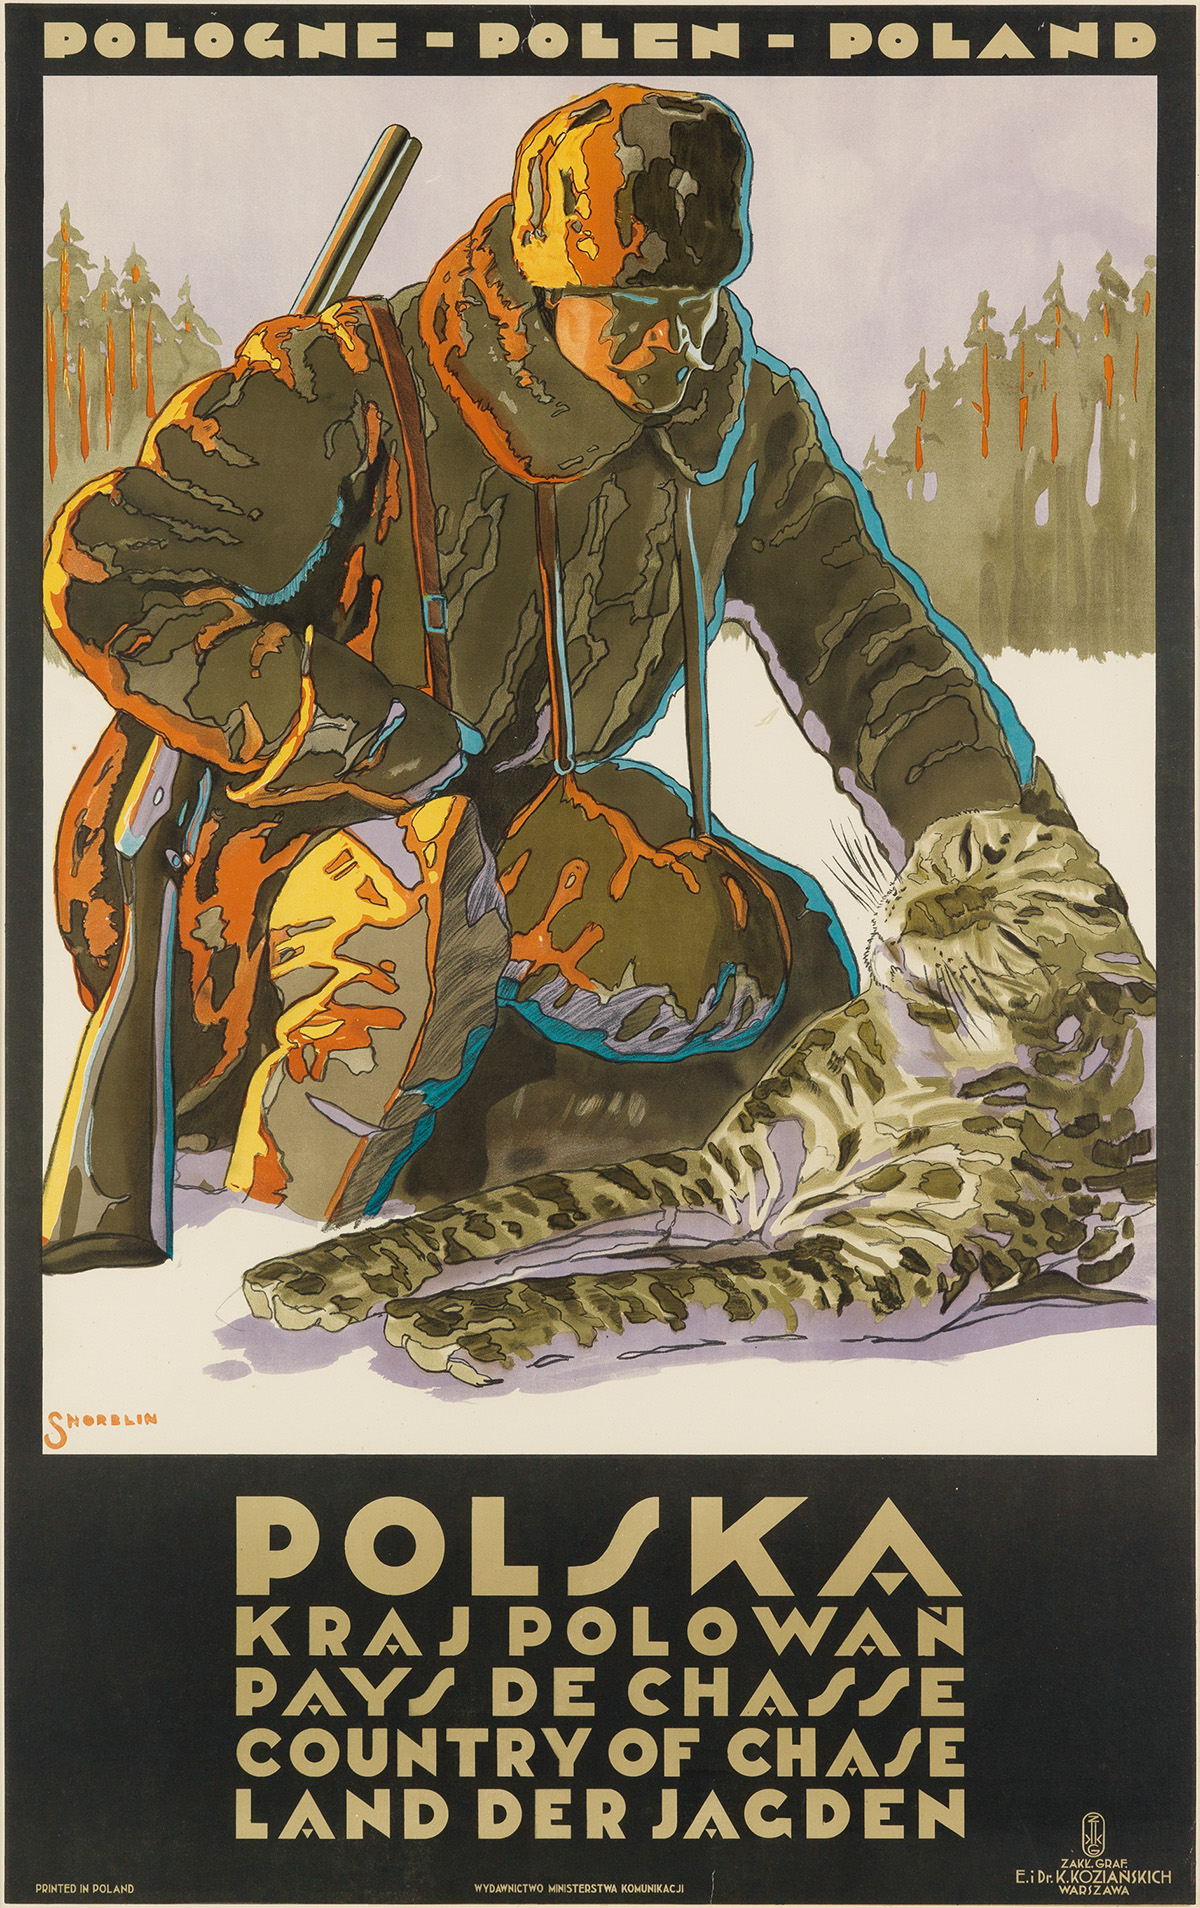 STEFAN-NORBLIN-(1892-1952)-POLSKA-Circa-1925-39x25-inches-99